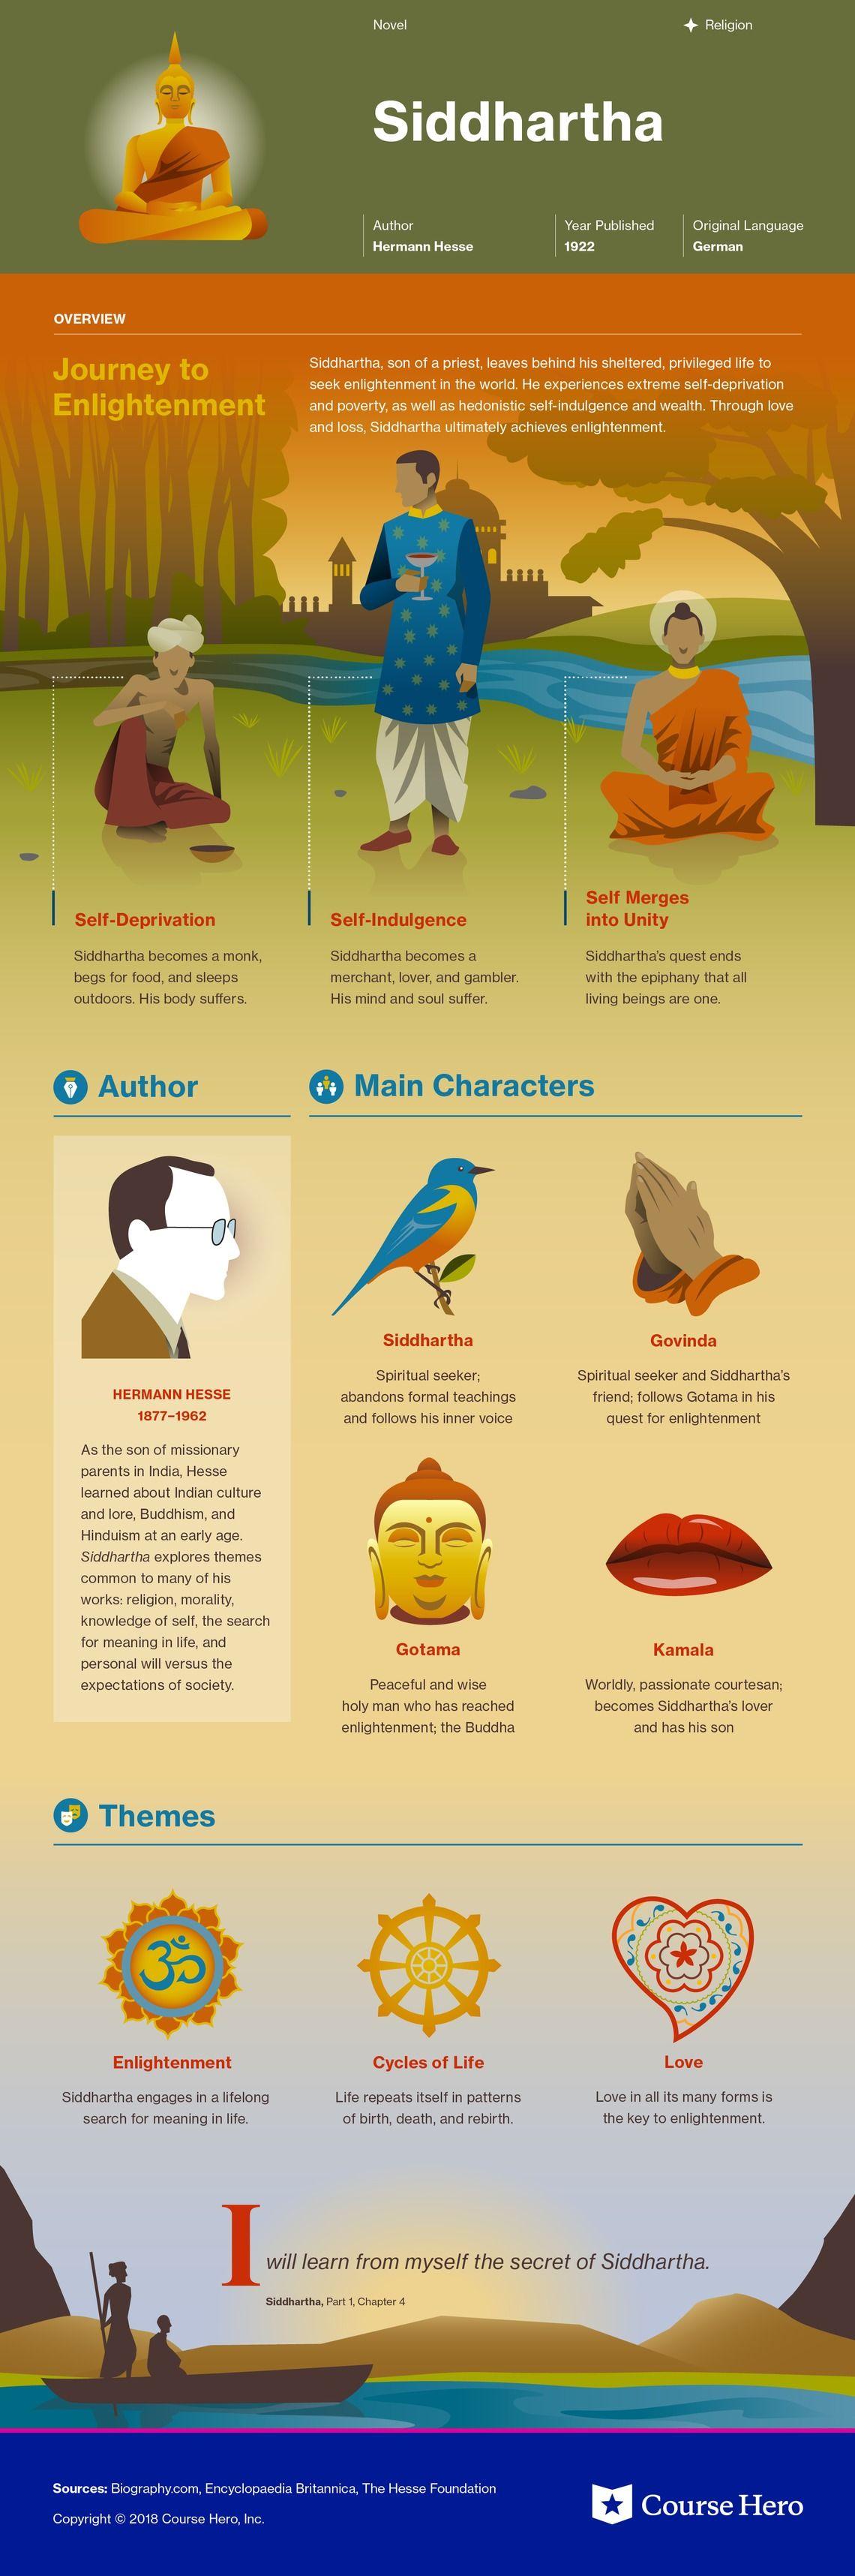 Siddhartha Infographic Booksliterature Literature Books